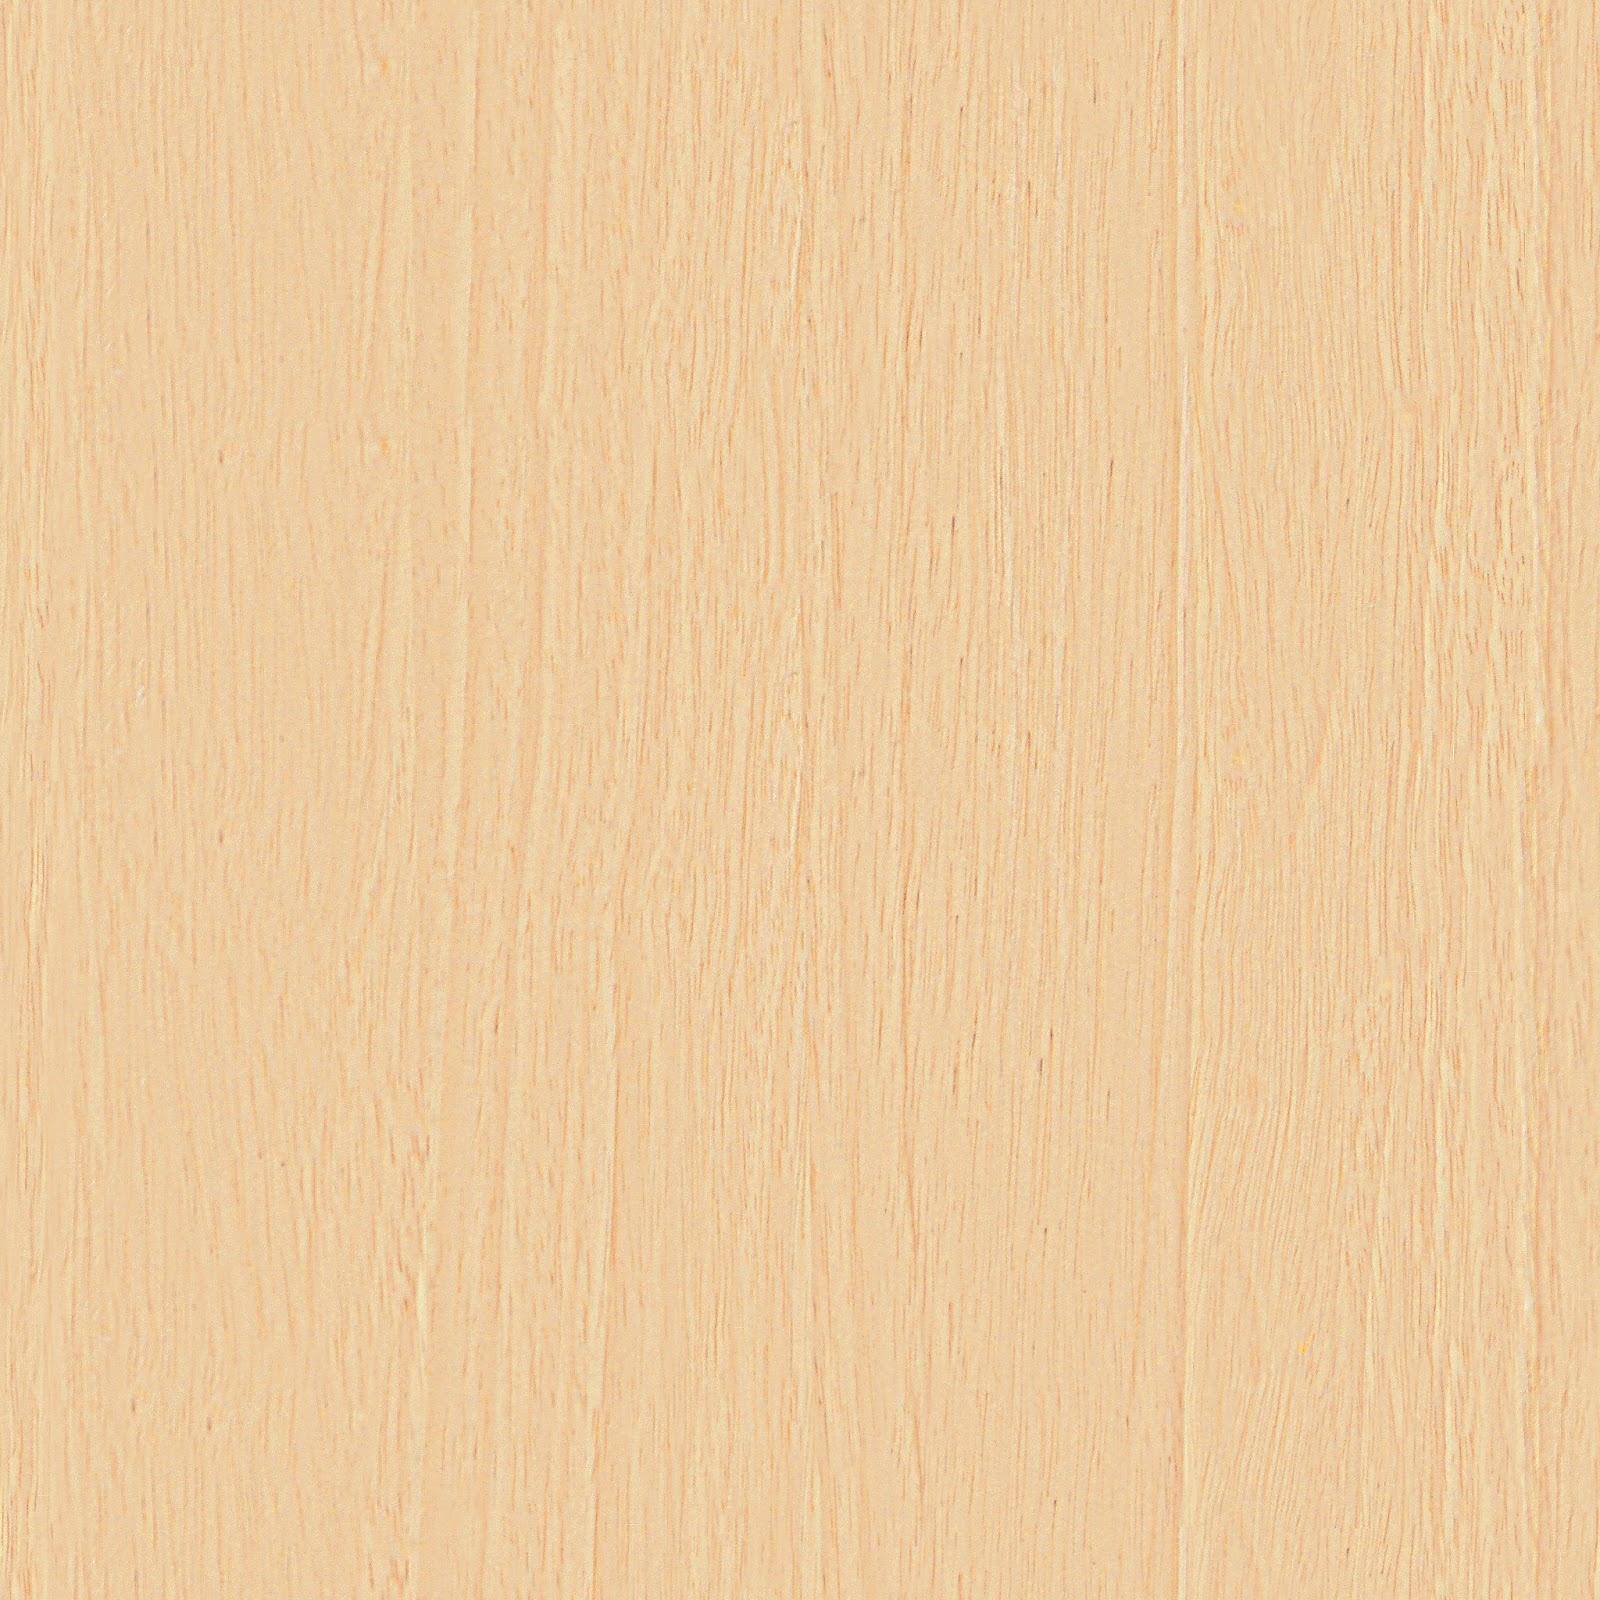 Interiores y 3d 3 v ray madera y tarima - Tarima madera interior ...